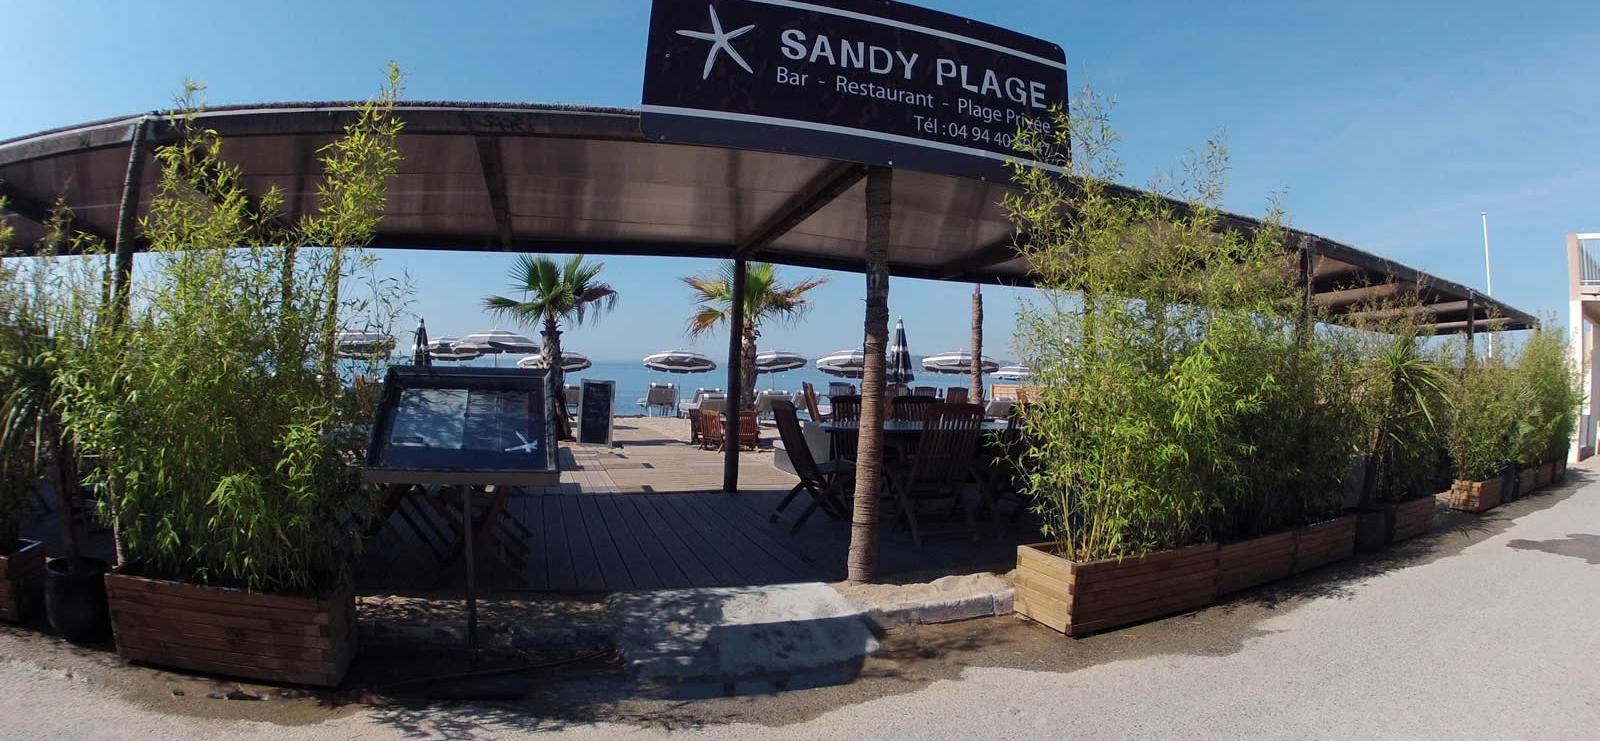 Sandy plage